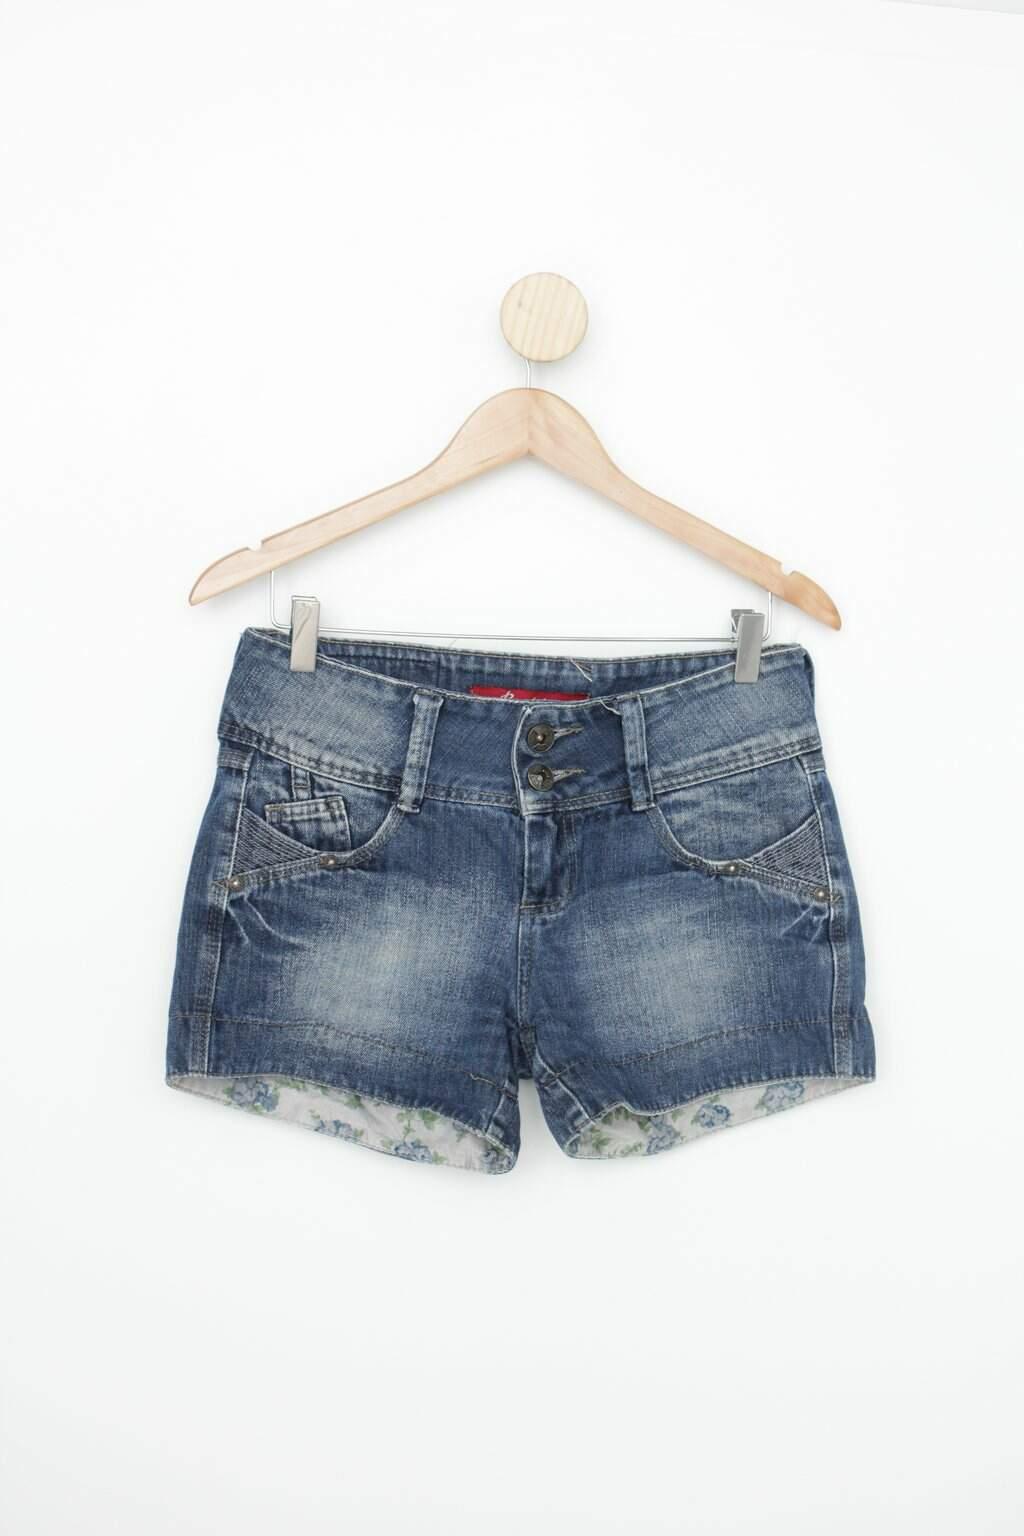 Shorts Brokker Feminina Azul